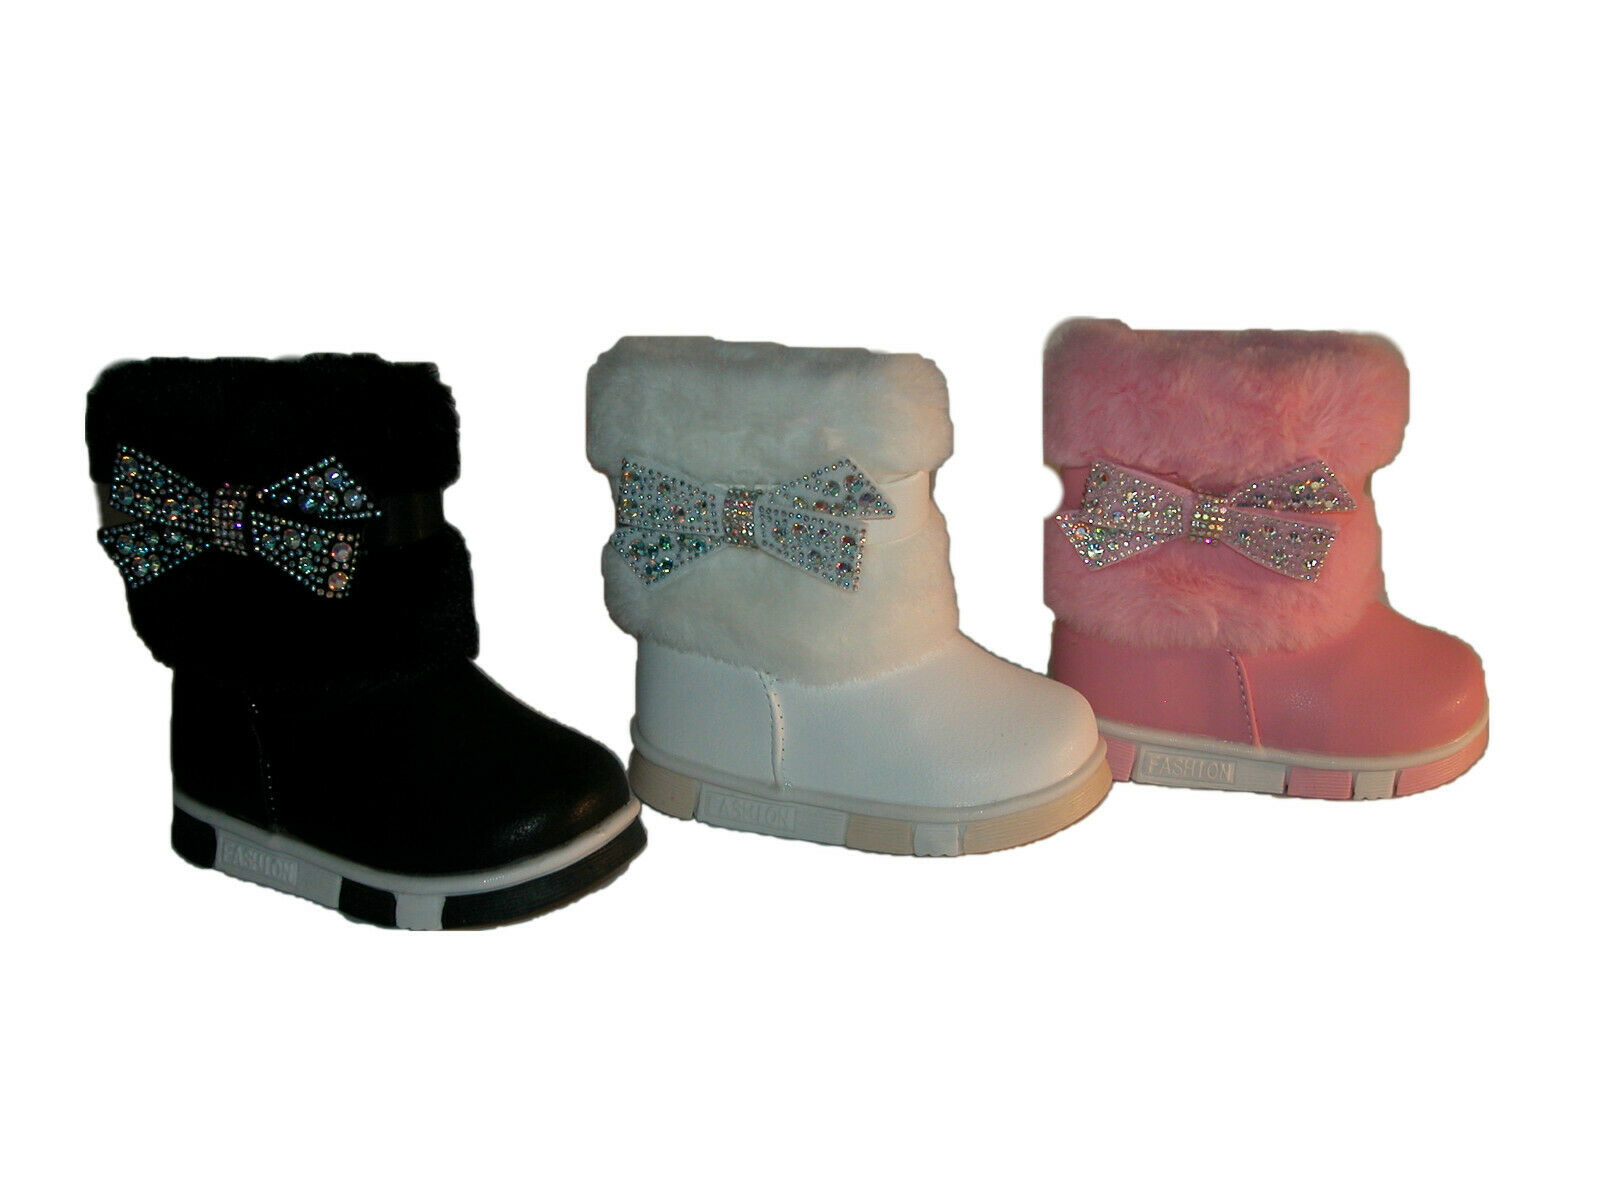 Winter Stiefel Kinder Schuhe Boots Kunstfell 42A Stiefeletten Gefüttert Gr:20-25